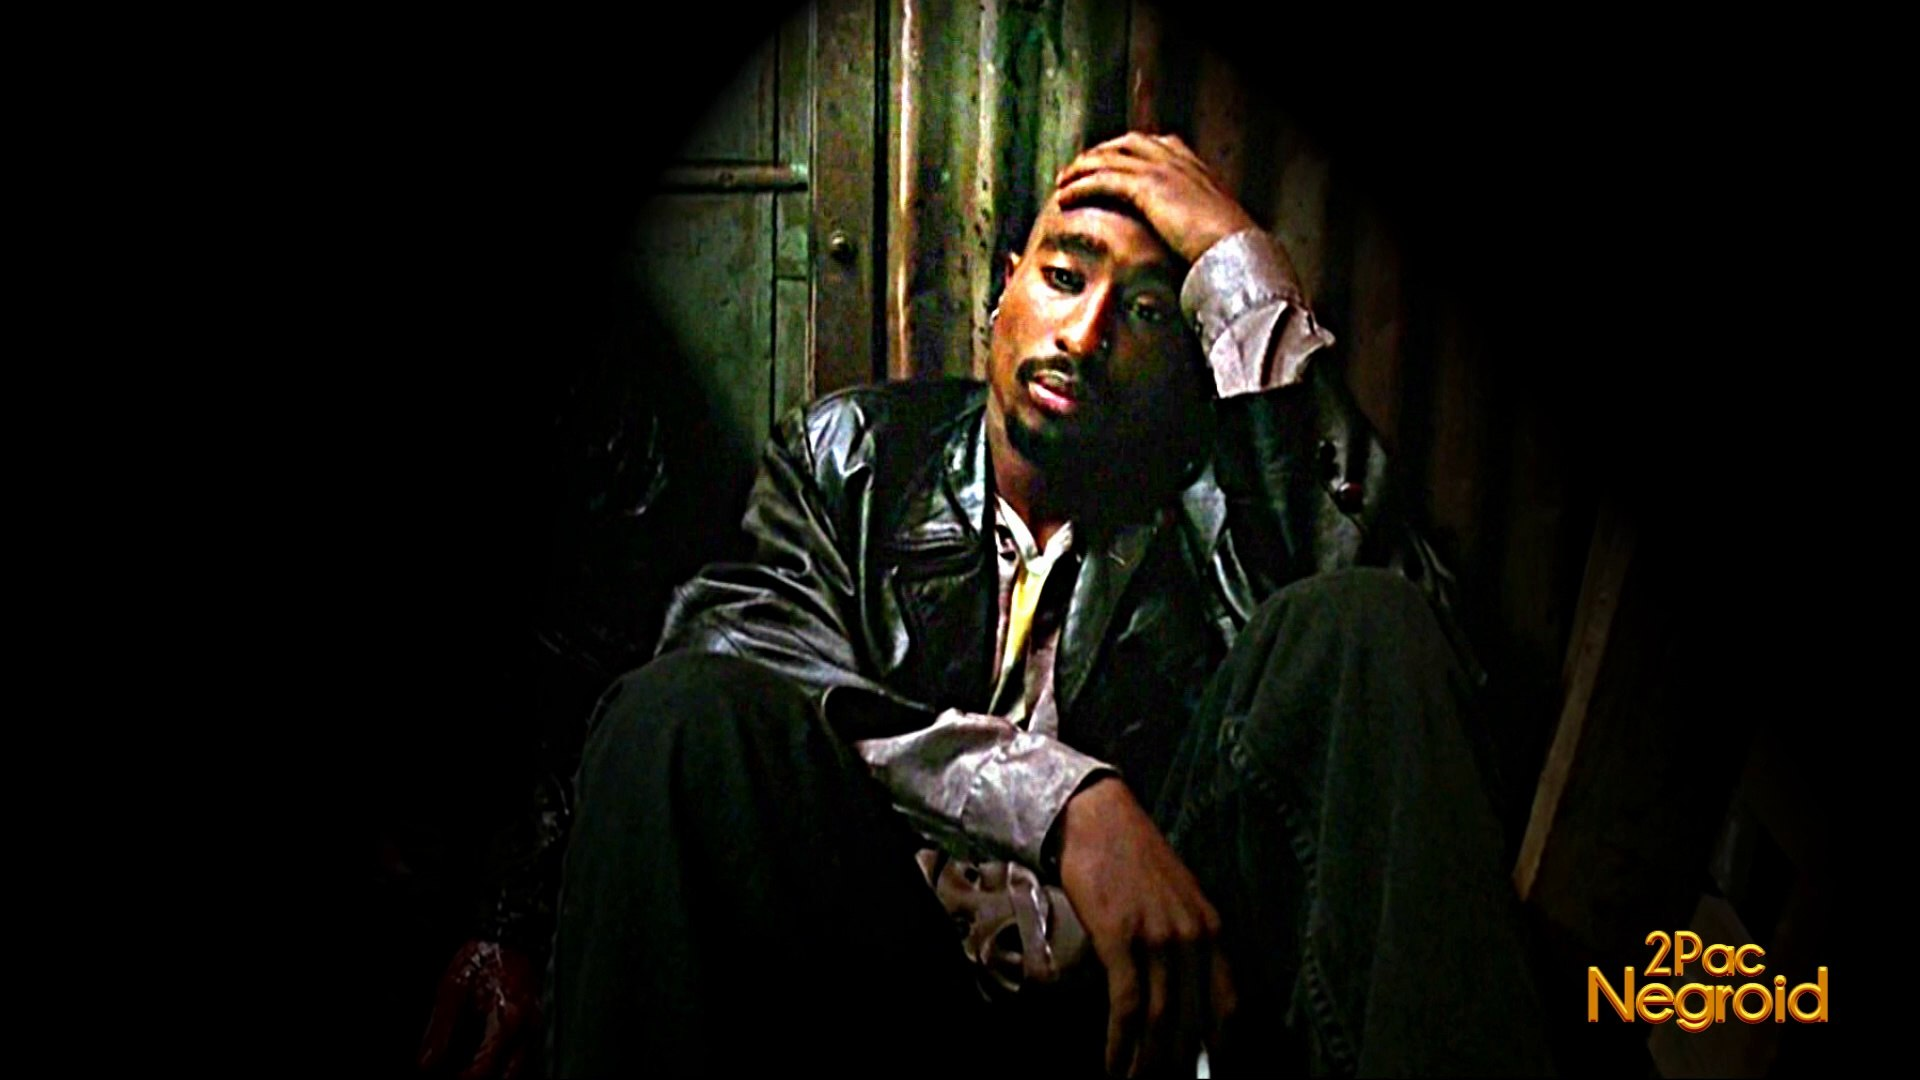 2Pac - They Murdered Me  - (HD Music Video Tupac Shakur) 2019